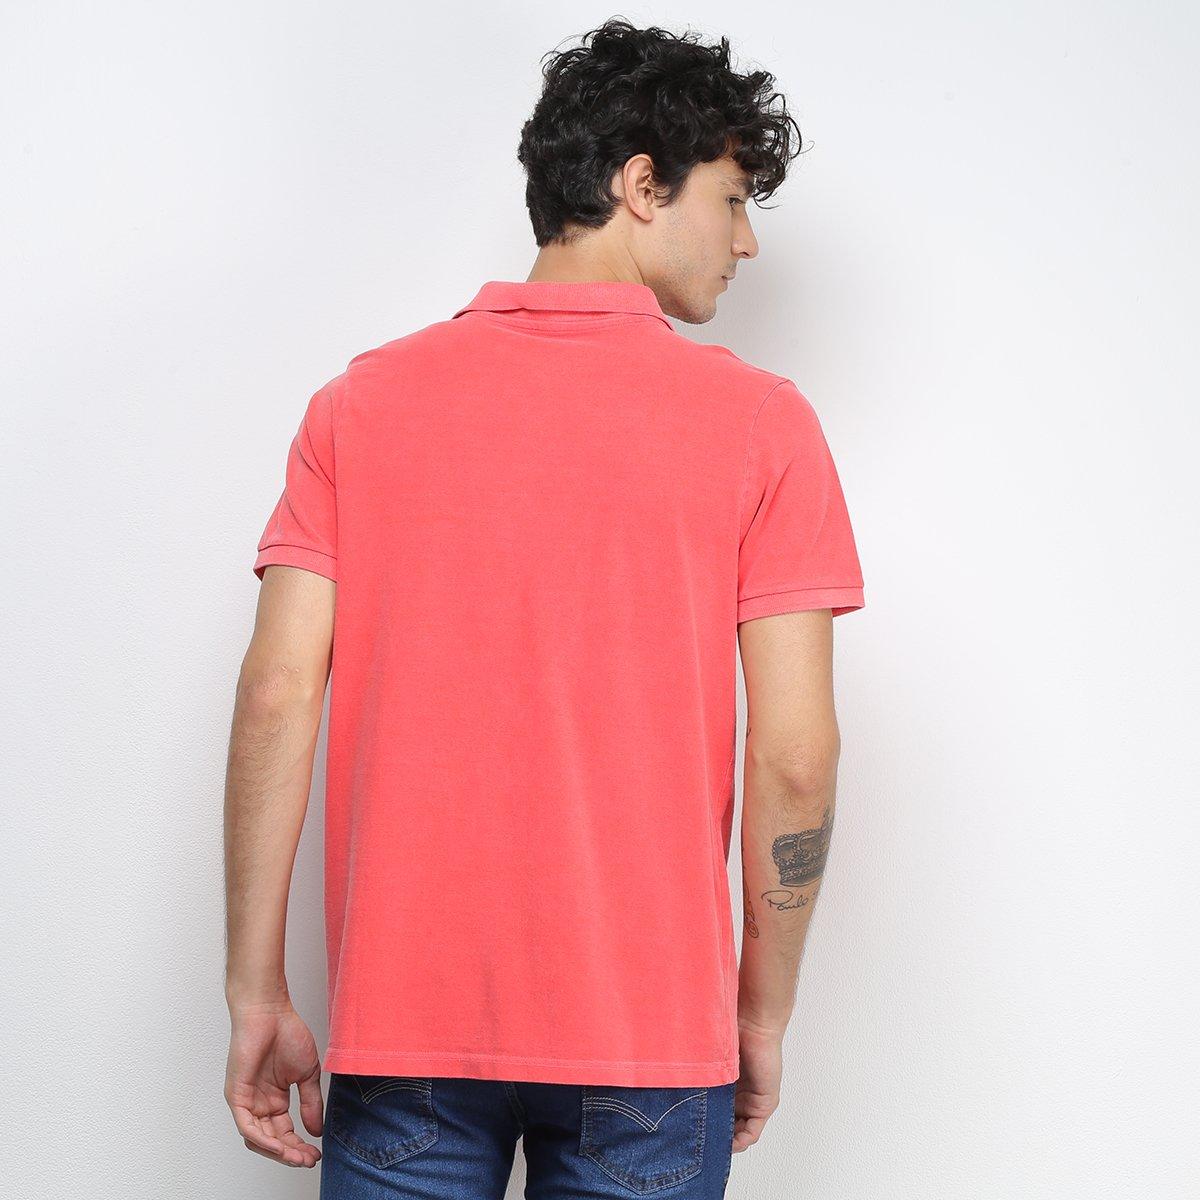 Camisa Polo Derek Ho Tinturada Piquet Básica Masculina - Vermelho